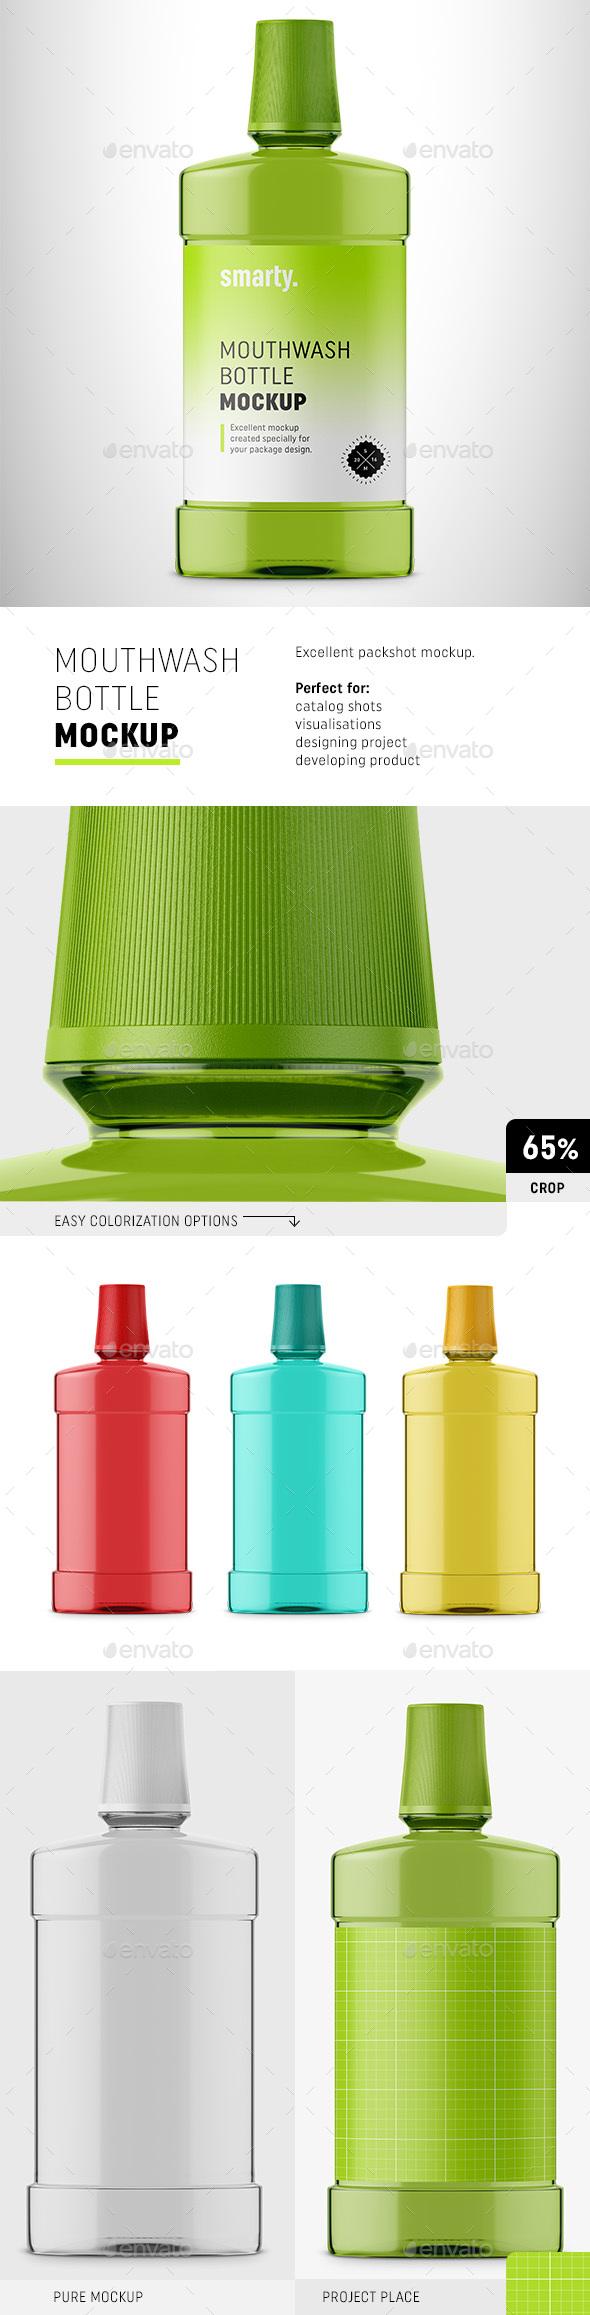 Mouthwash Bottle Mockup - Miscellaneous Packaging